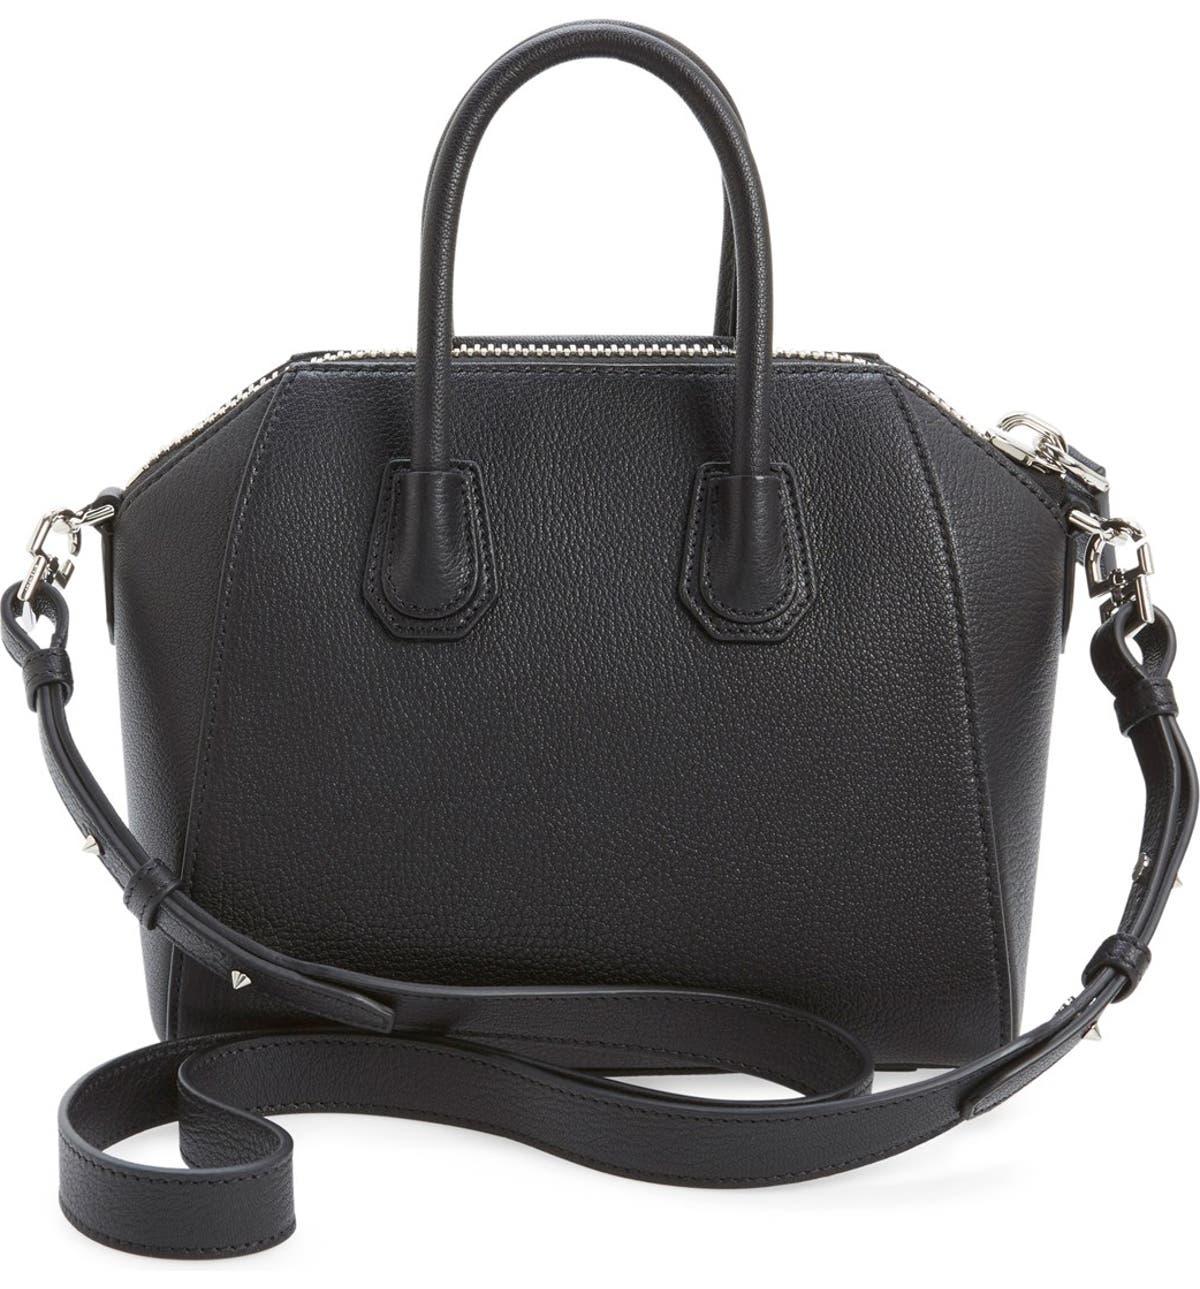 91dce125a1b5a Givenchy 'Mini Antigona' Sugar Leather Satchel | Nordstrom